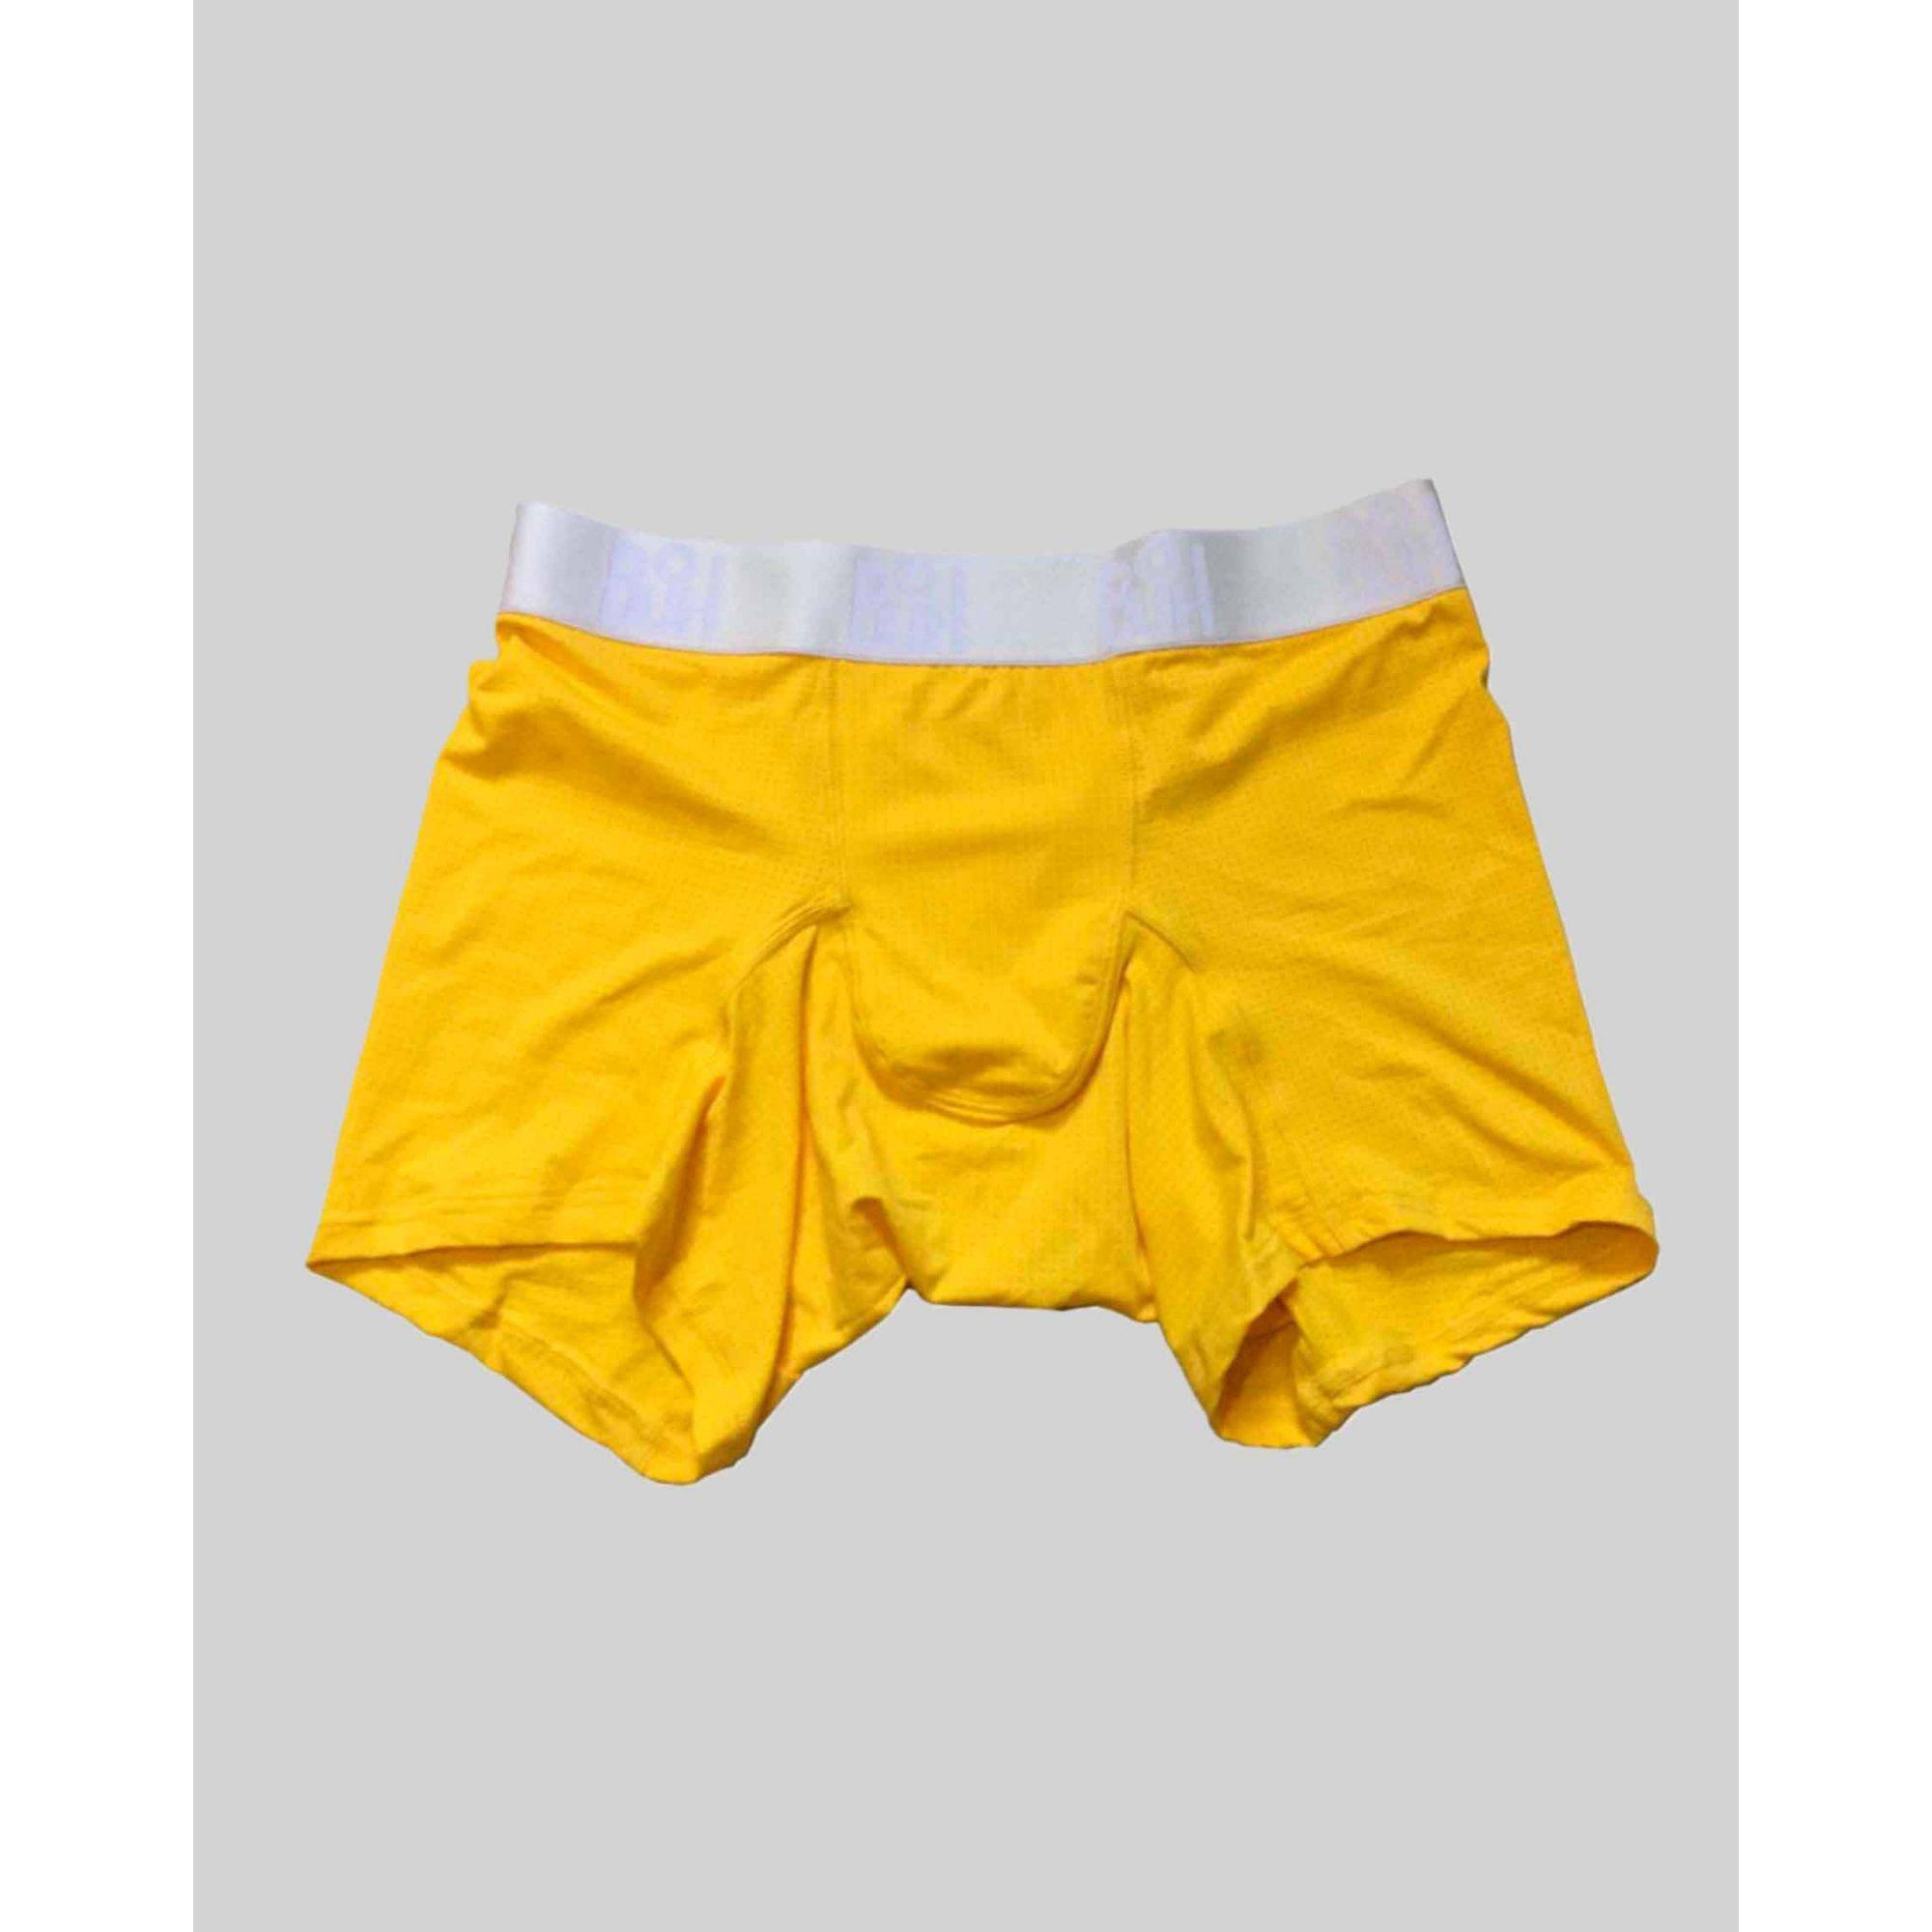 Cueca Buh Yellow